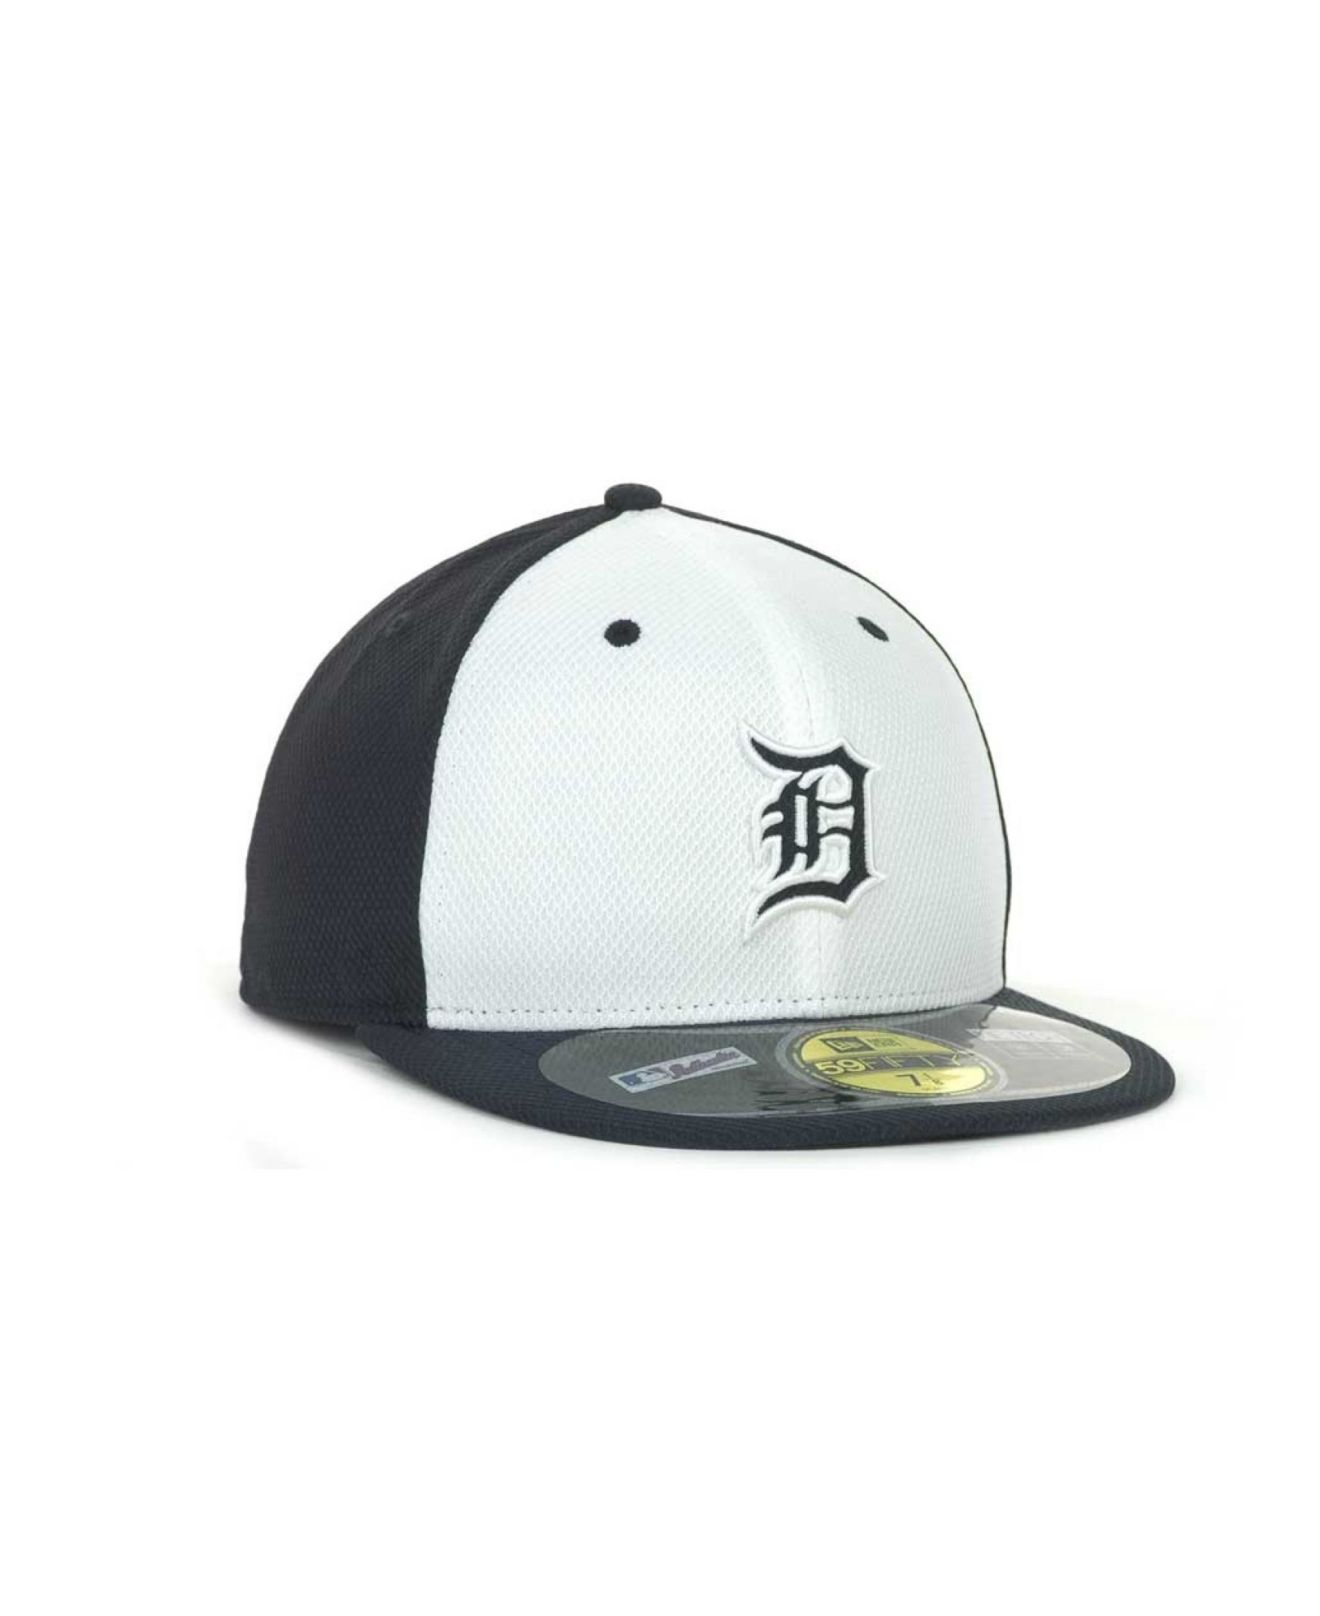 5745654f Lyst - KTZ Detroit Tigers Diamond Era 59fifty Cap in Blue for Men